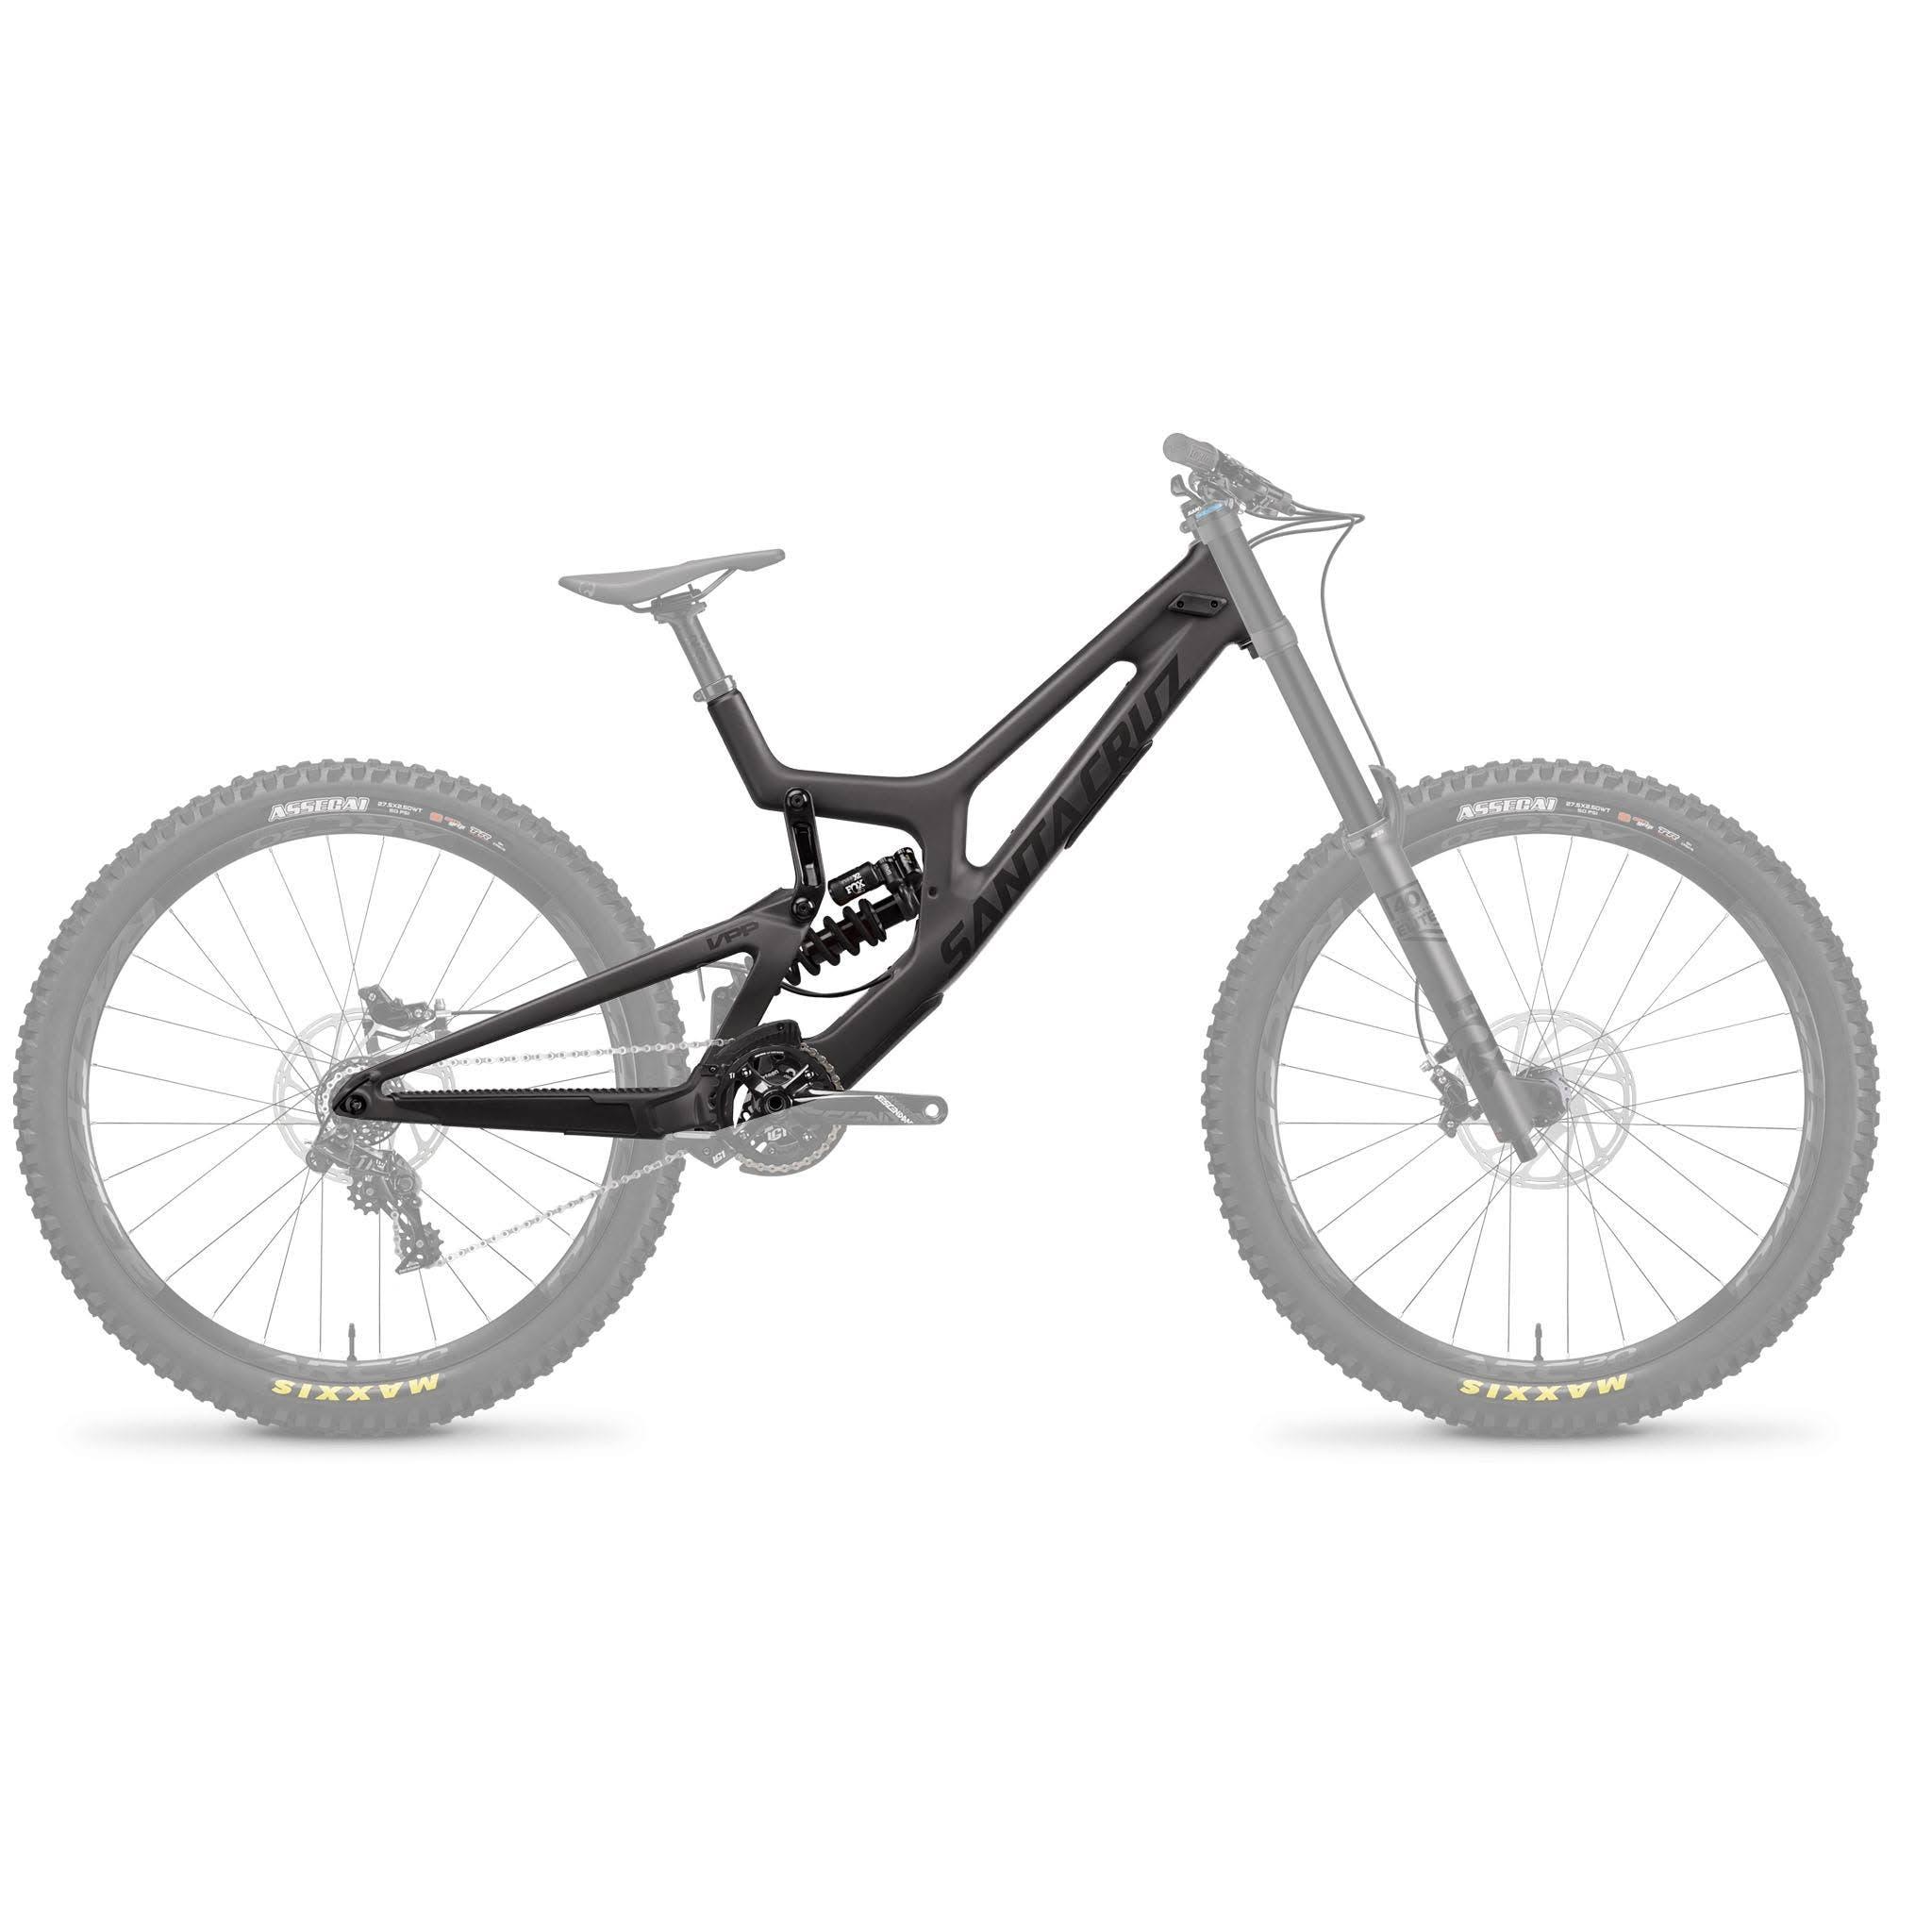 Santa Cruz V10 CC 27.5 Frameset Matte Carbon / MD